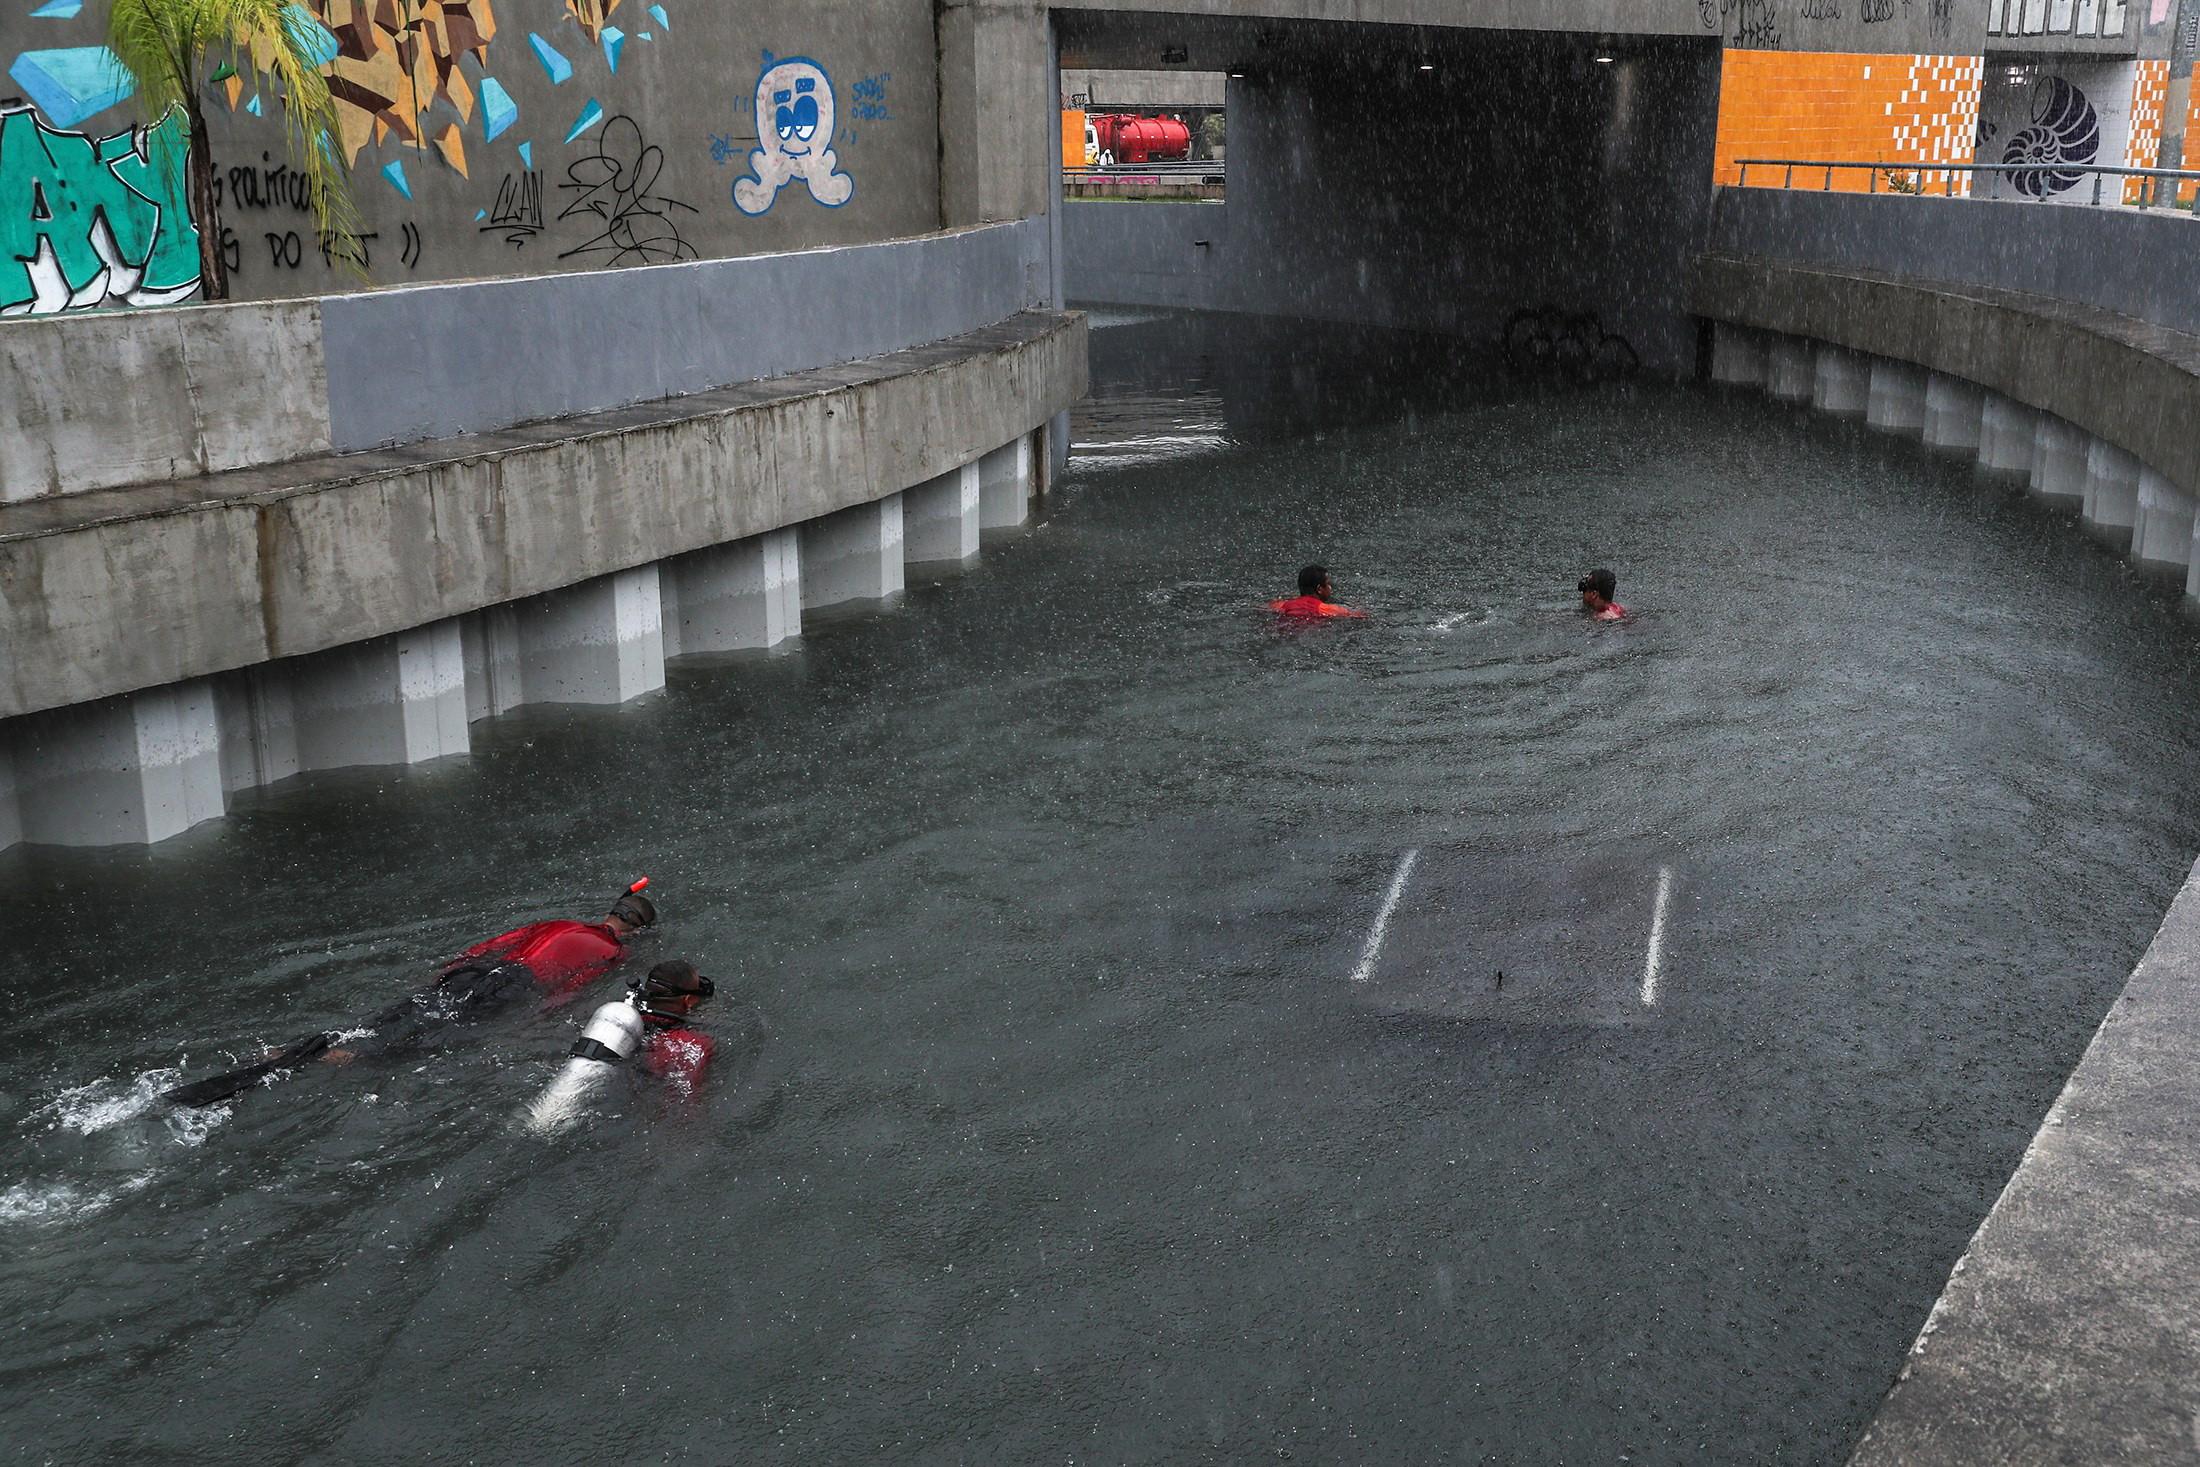 Número de mortos por causa das chuvas no Rio de Janeiro sobe para cinco